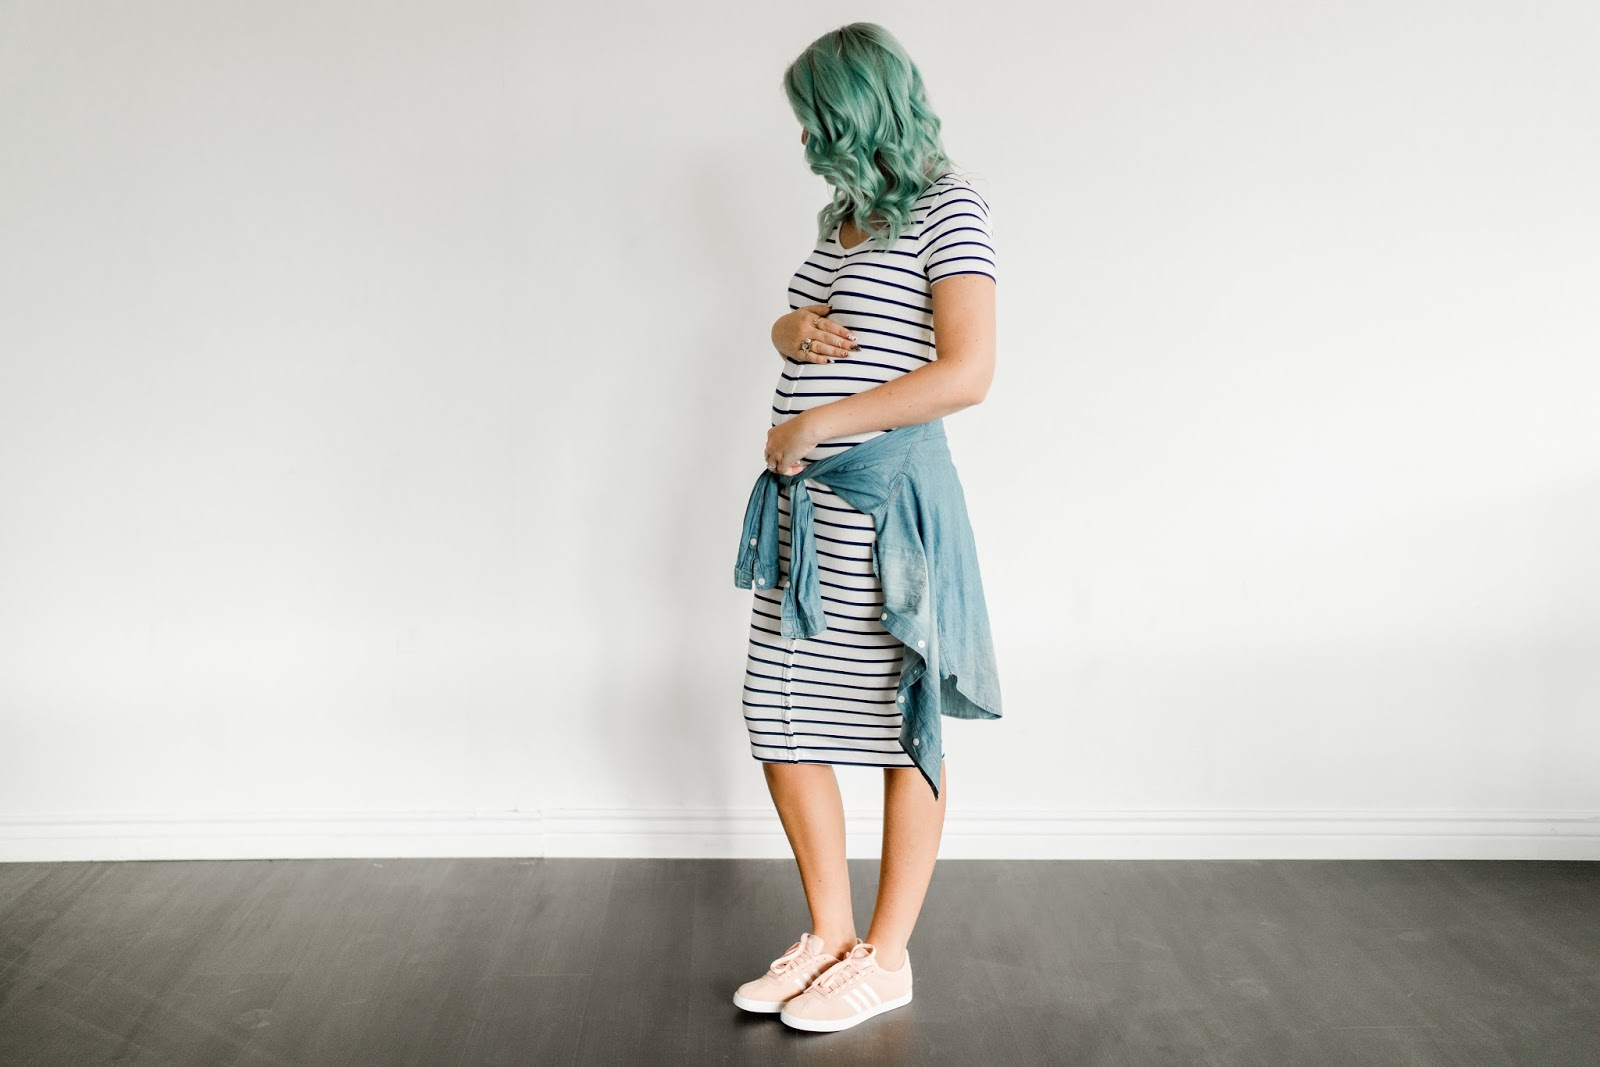 Blue Hair, maternity look, Pink Adidas